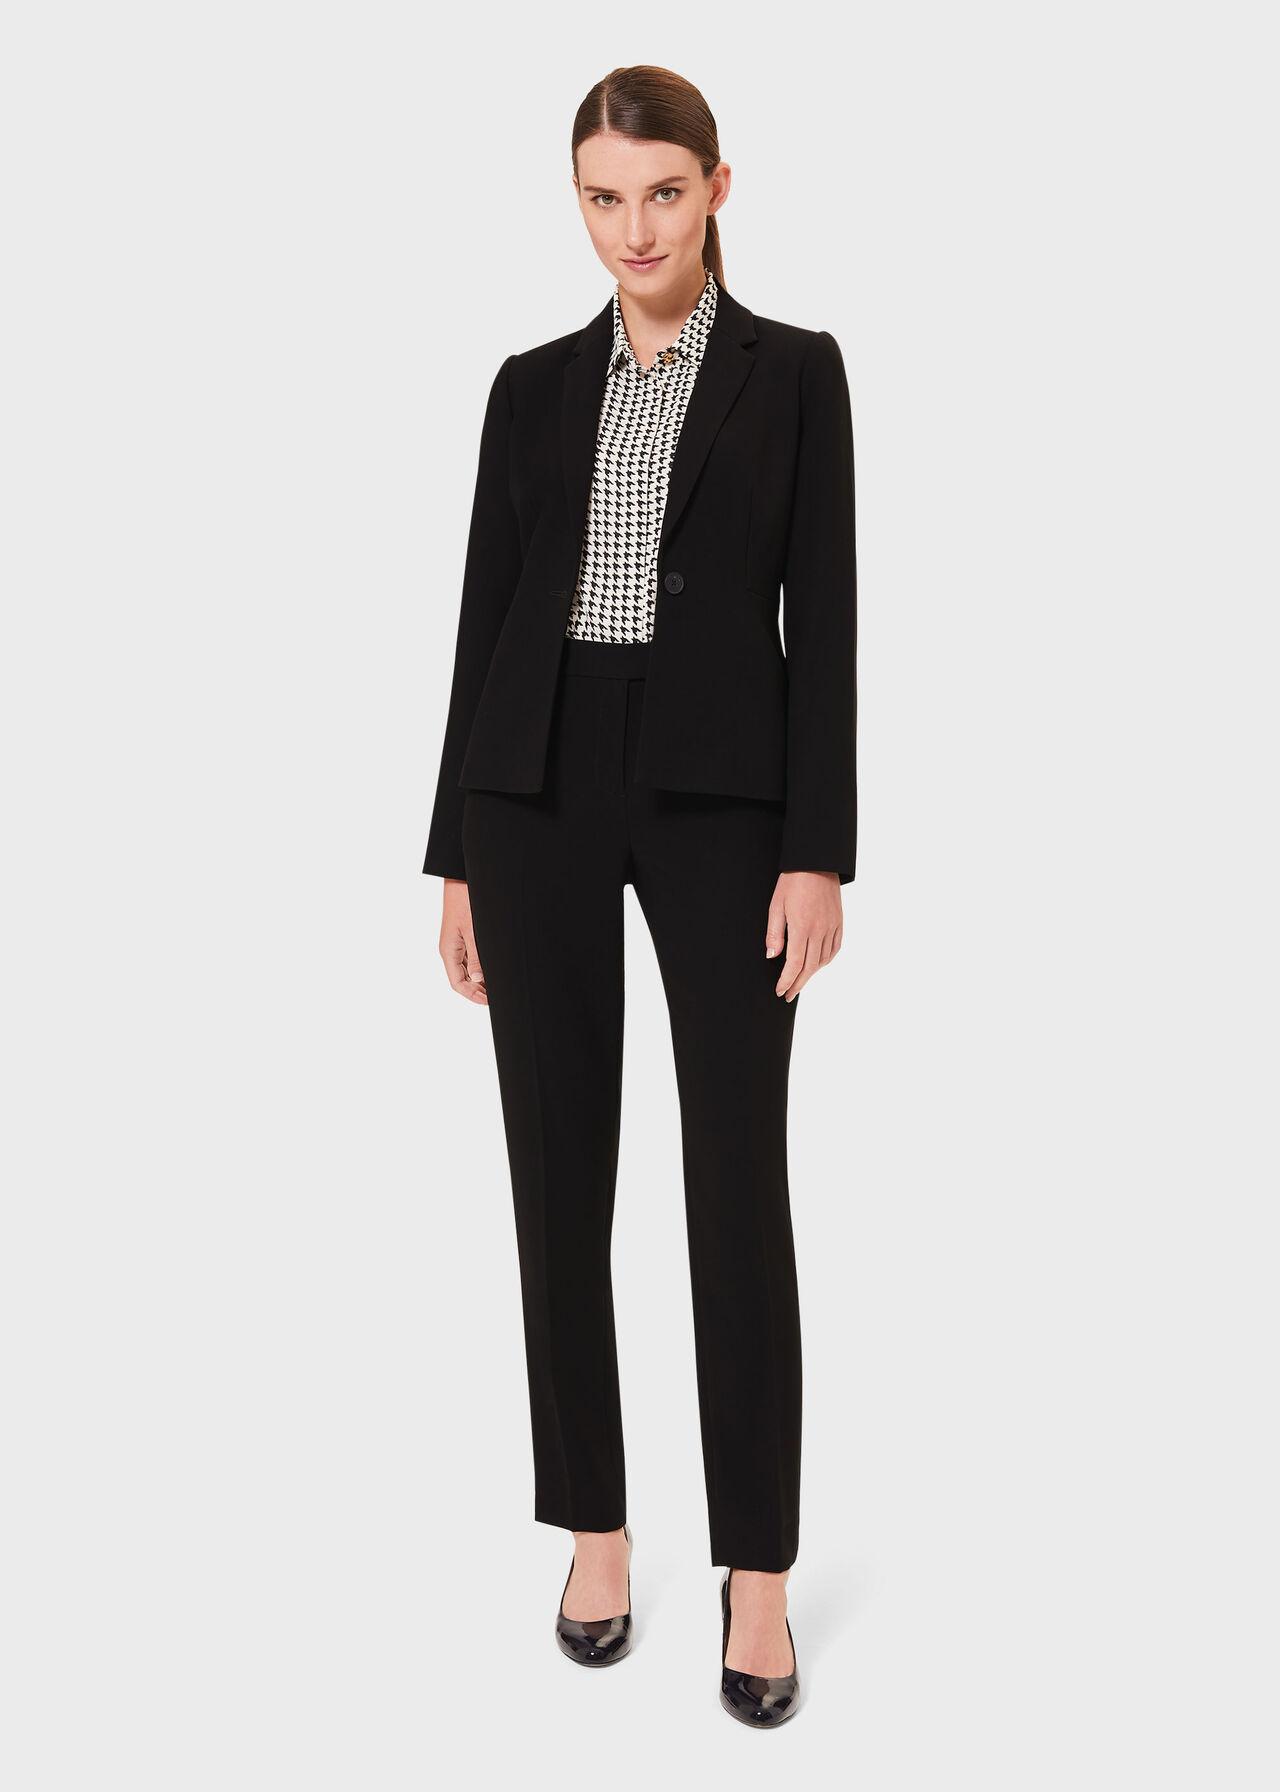 Alva Co-ord Tapered Trouser Suit, , hi-res